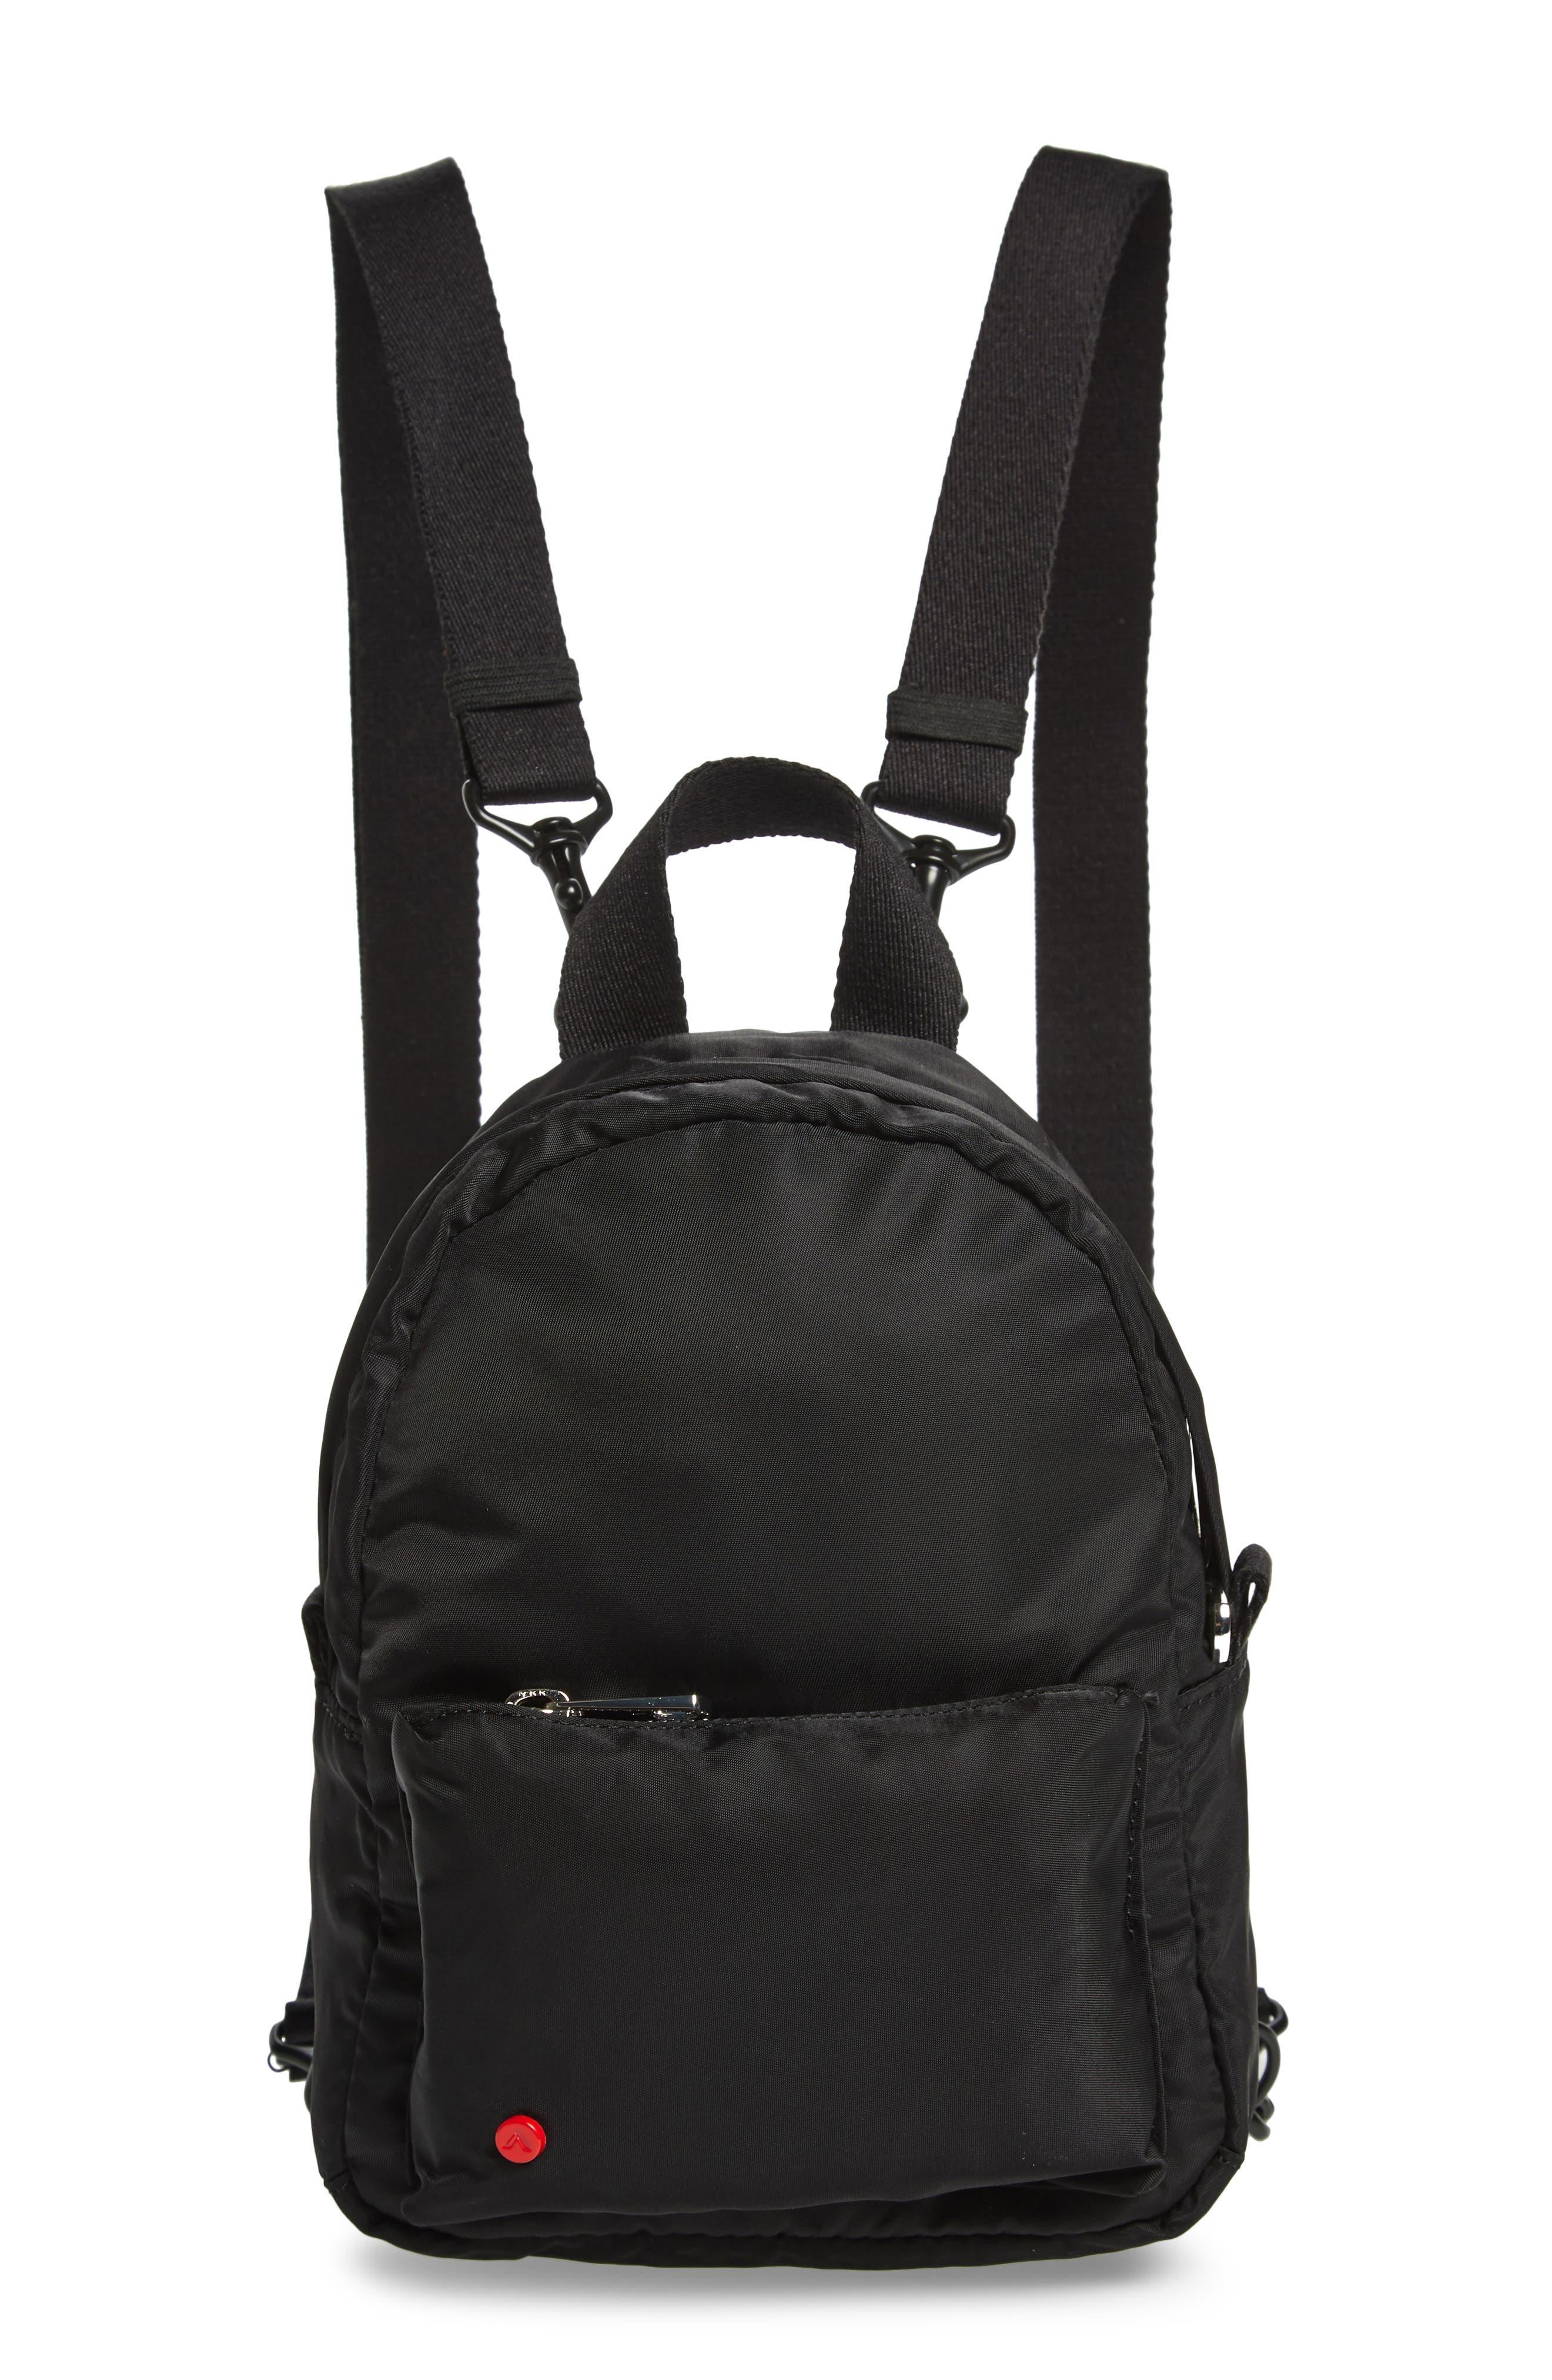 STATE Mini Hart Convertible Nylon Backpack - Black